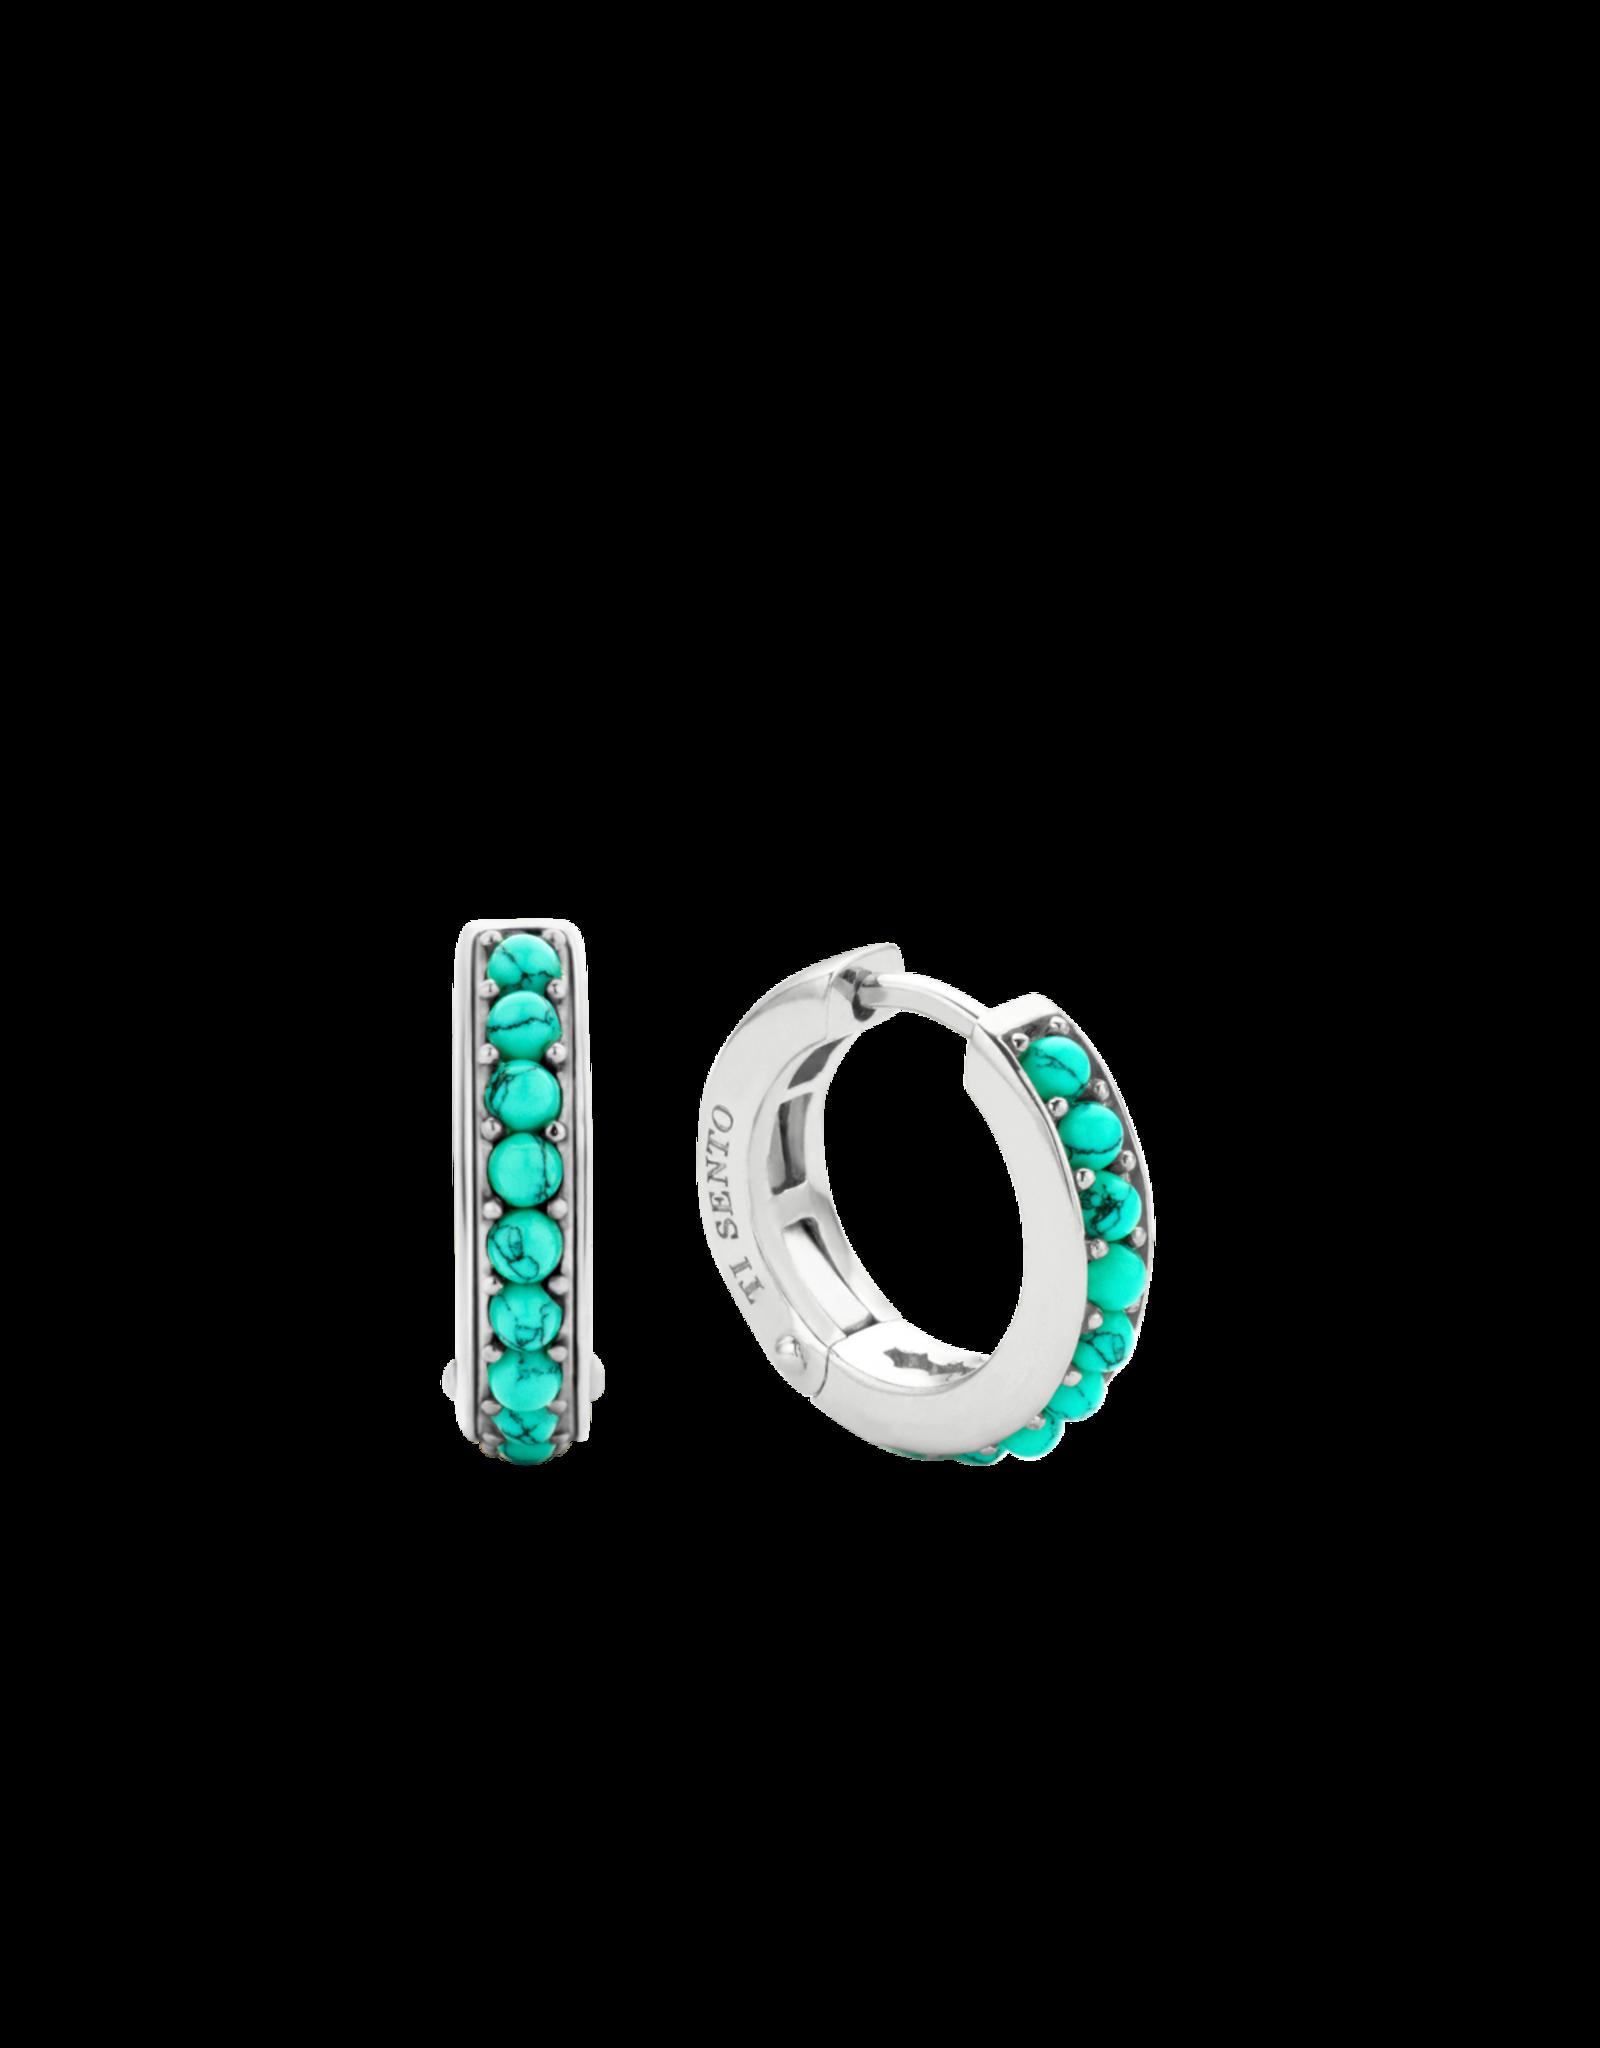 Turquoise Huggie Earrings- 7764TQ